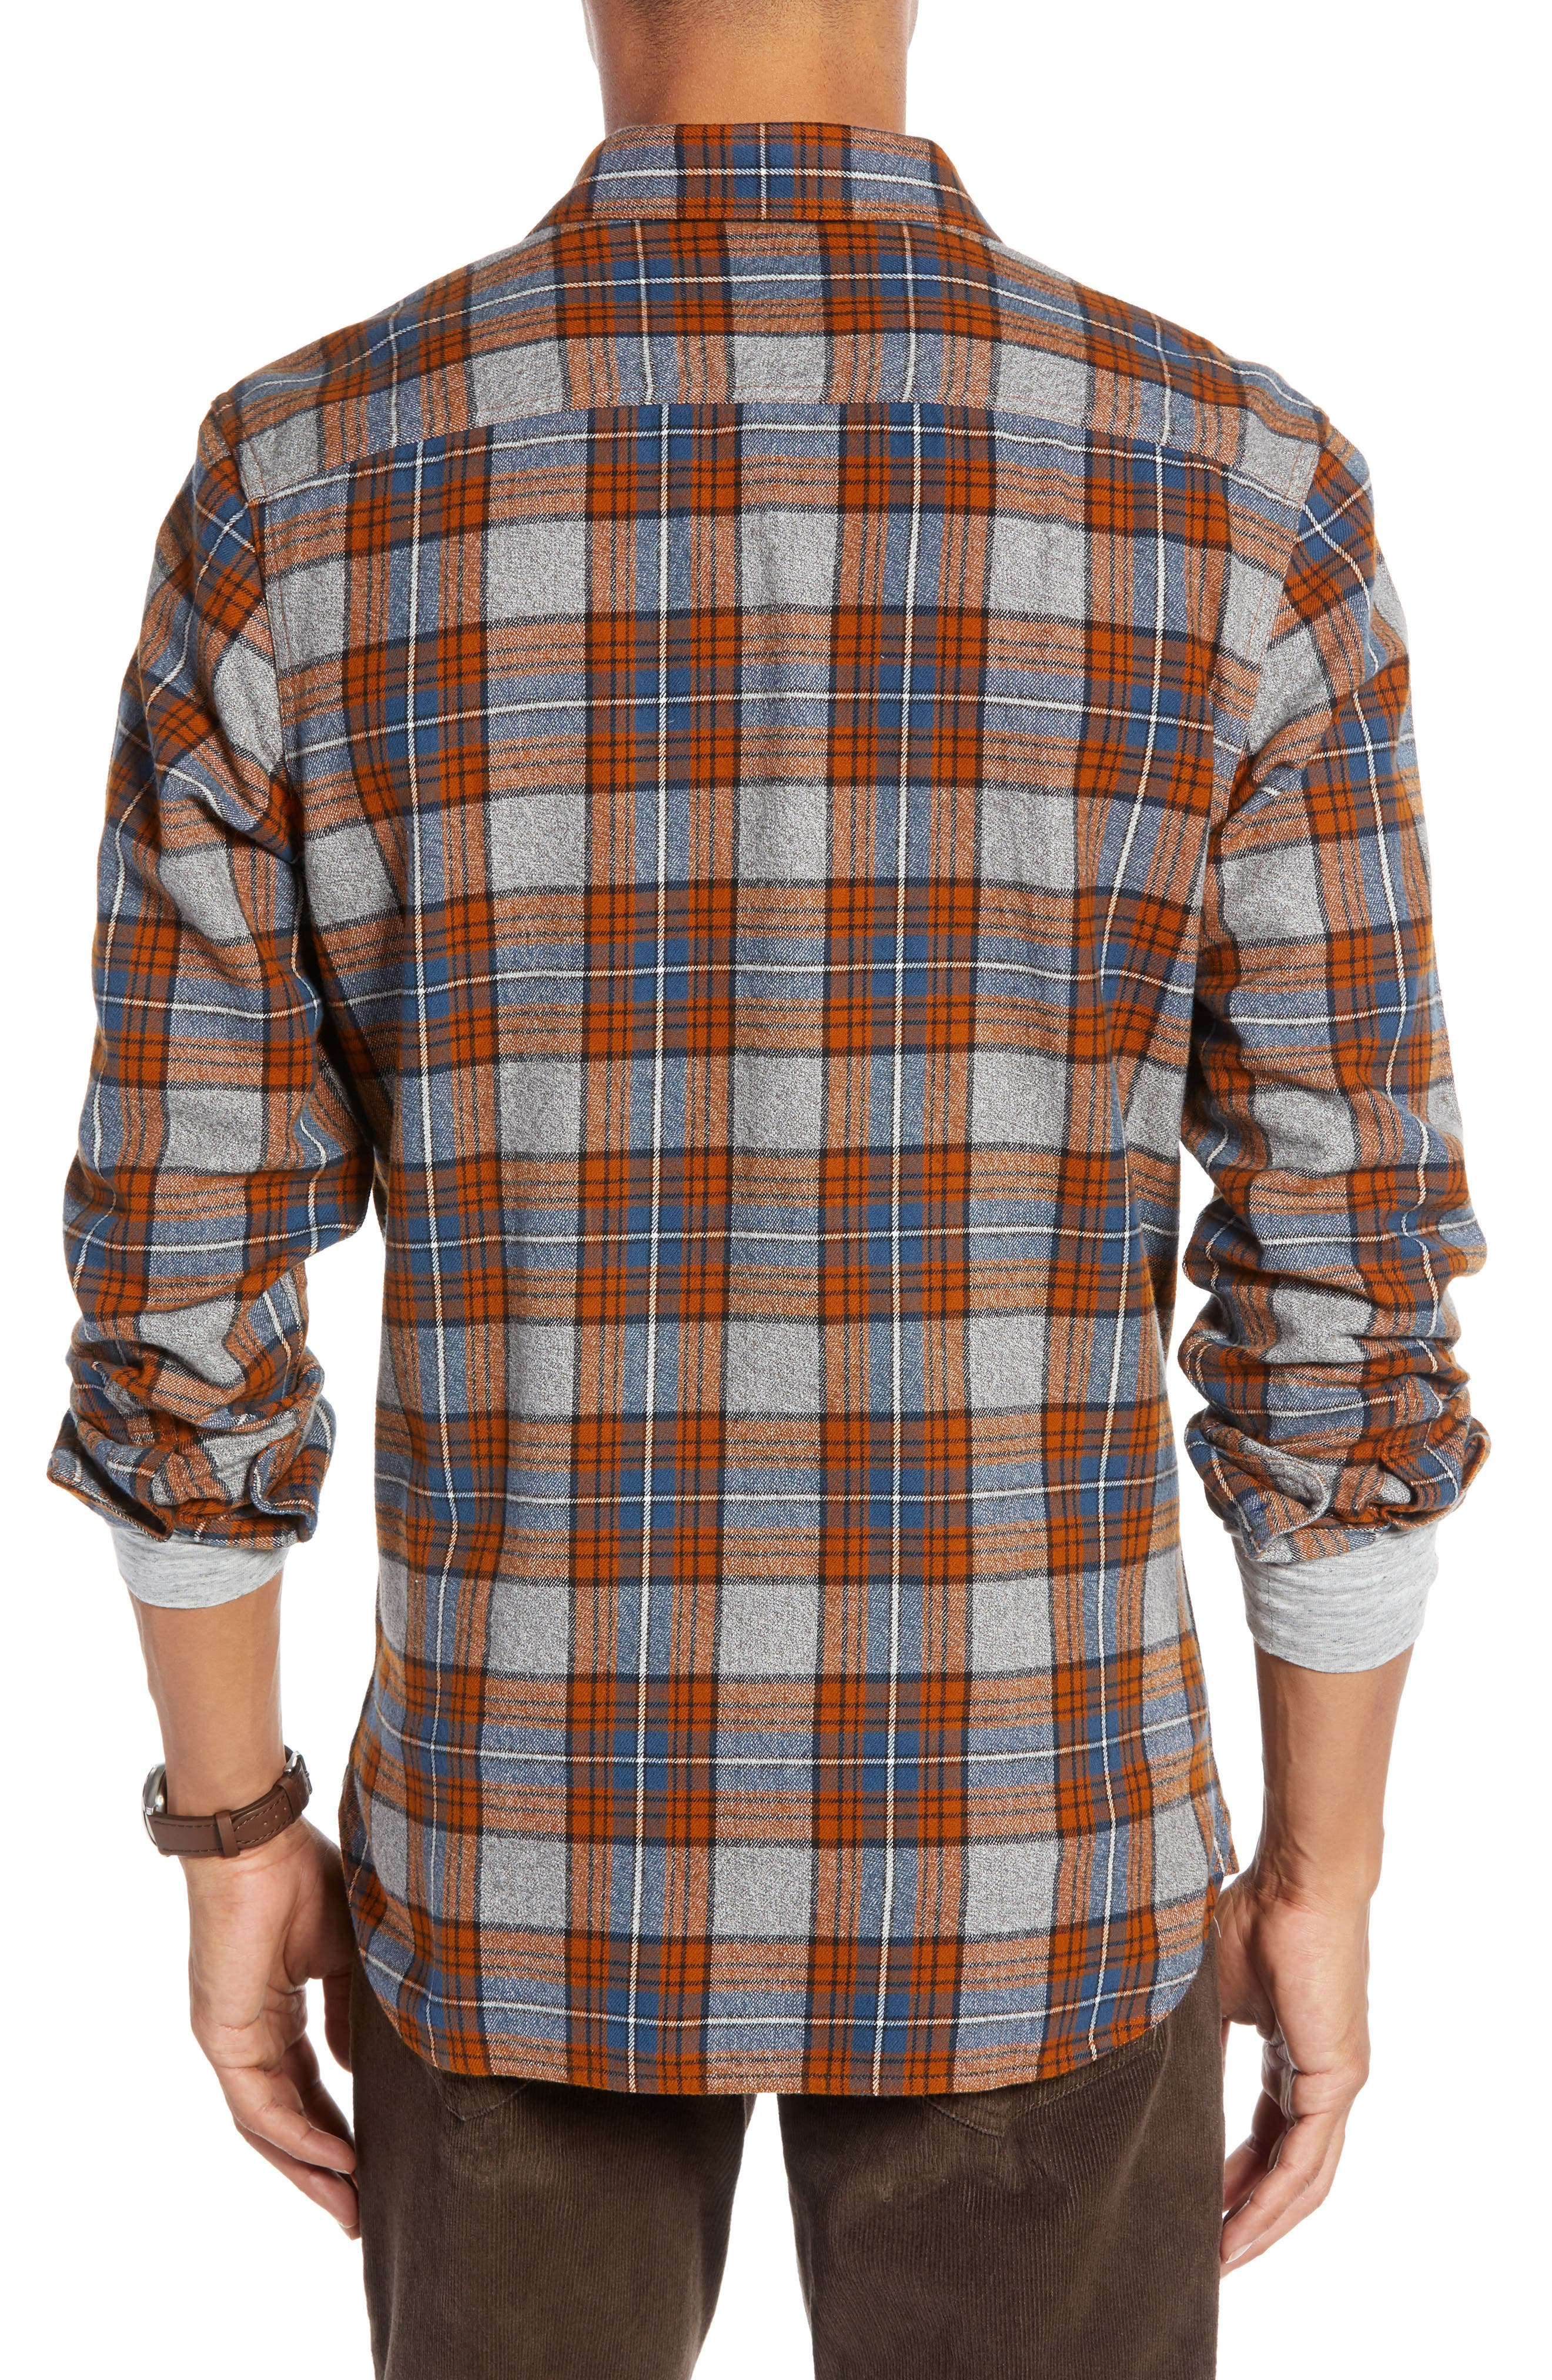 Regular Fit Workwear Plaid Flannel Shirt,                             Alternate thumbnail 2, color,                             RUST AUTUMN BLUE PLAID